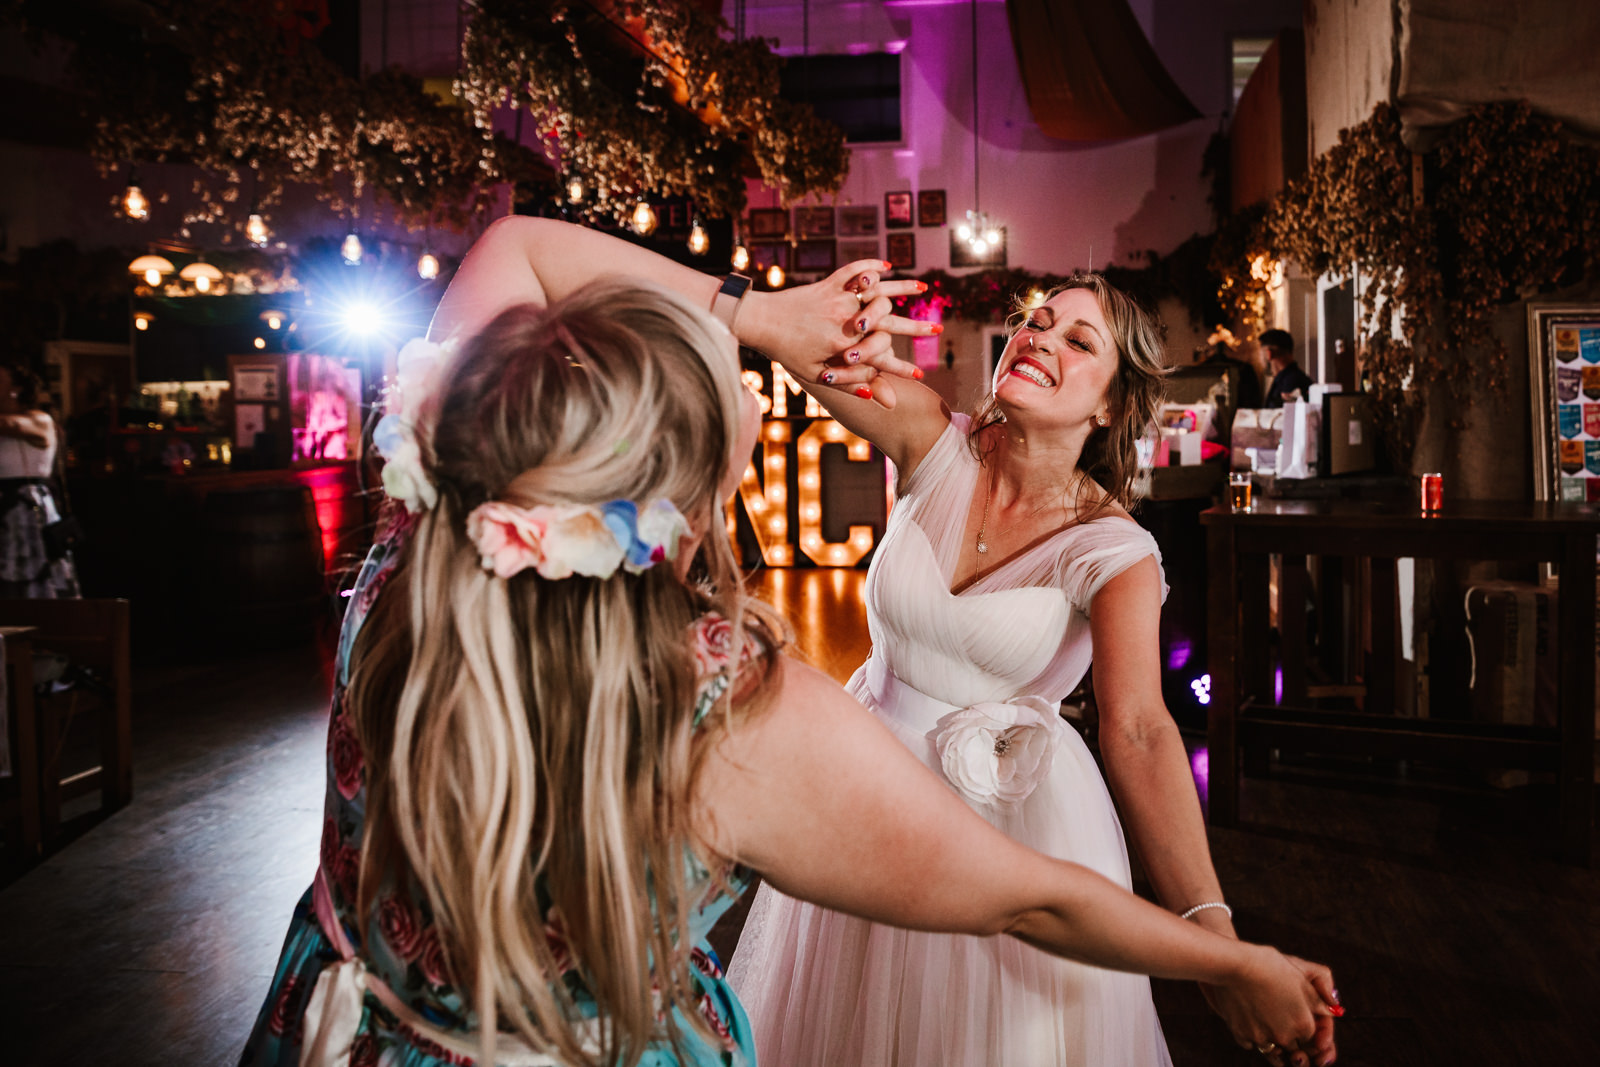 Bride dancing with her bridesmaid